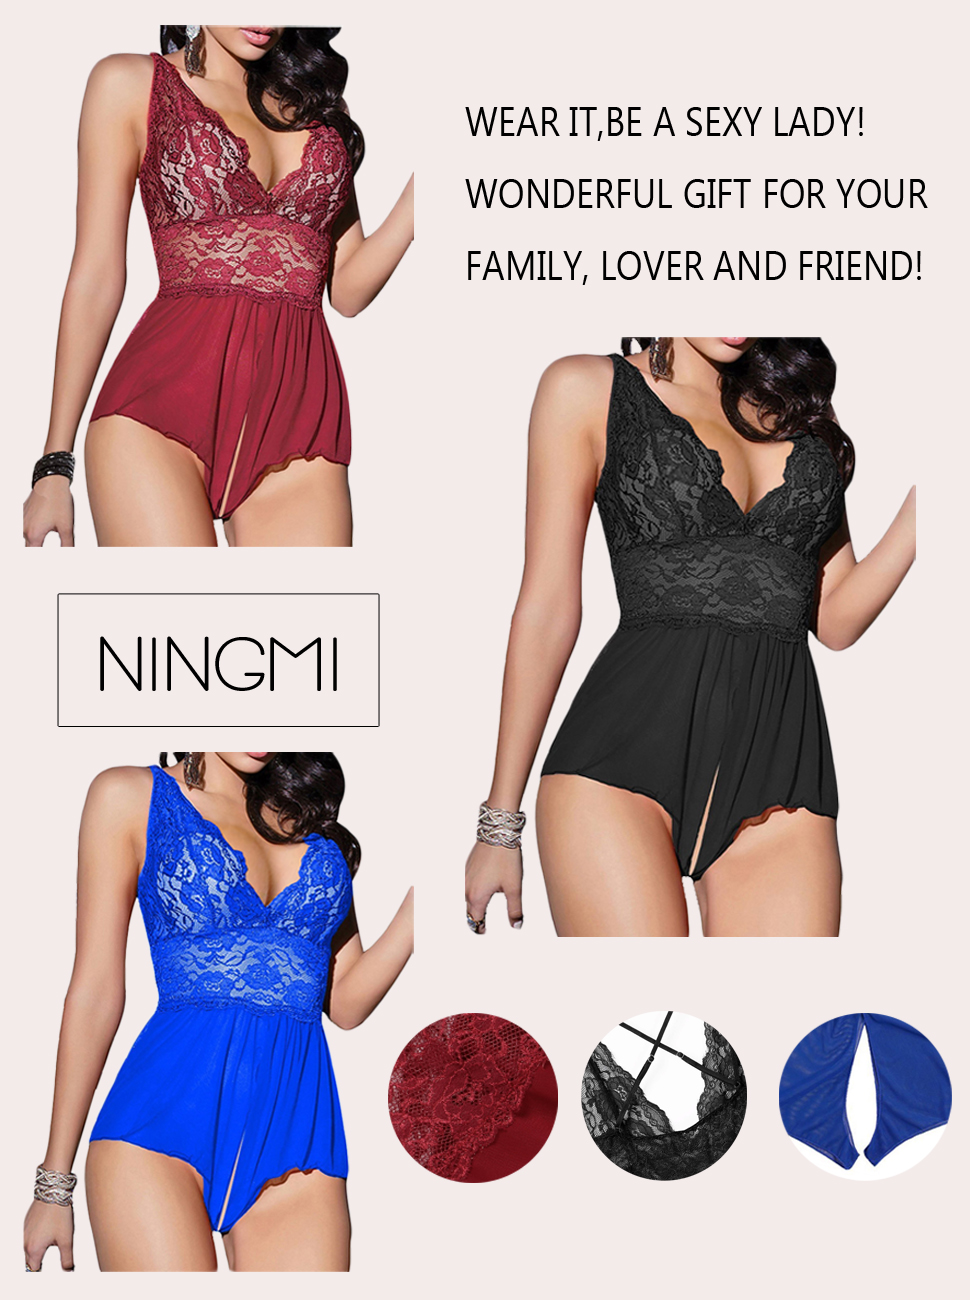 NINGMI Deep-V Lace Babydoll Lingerie Perspective Nightwear Sexy